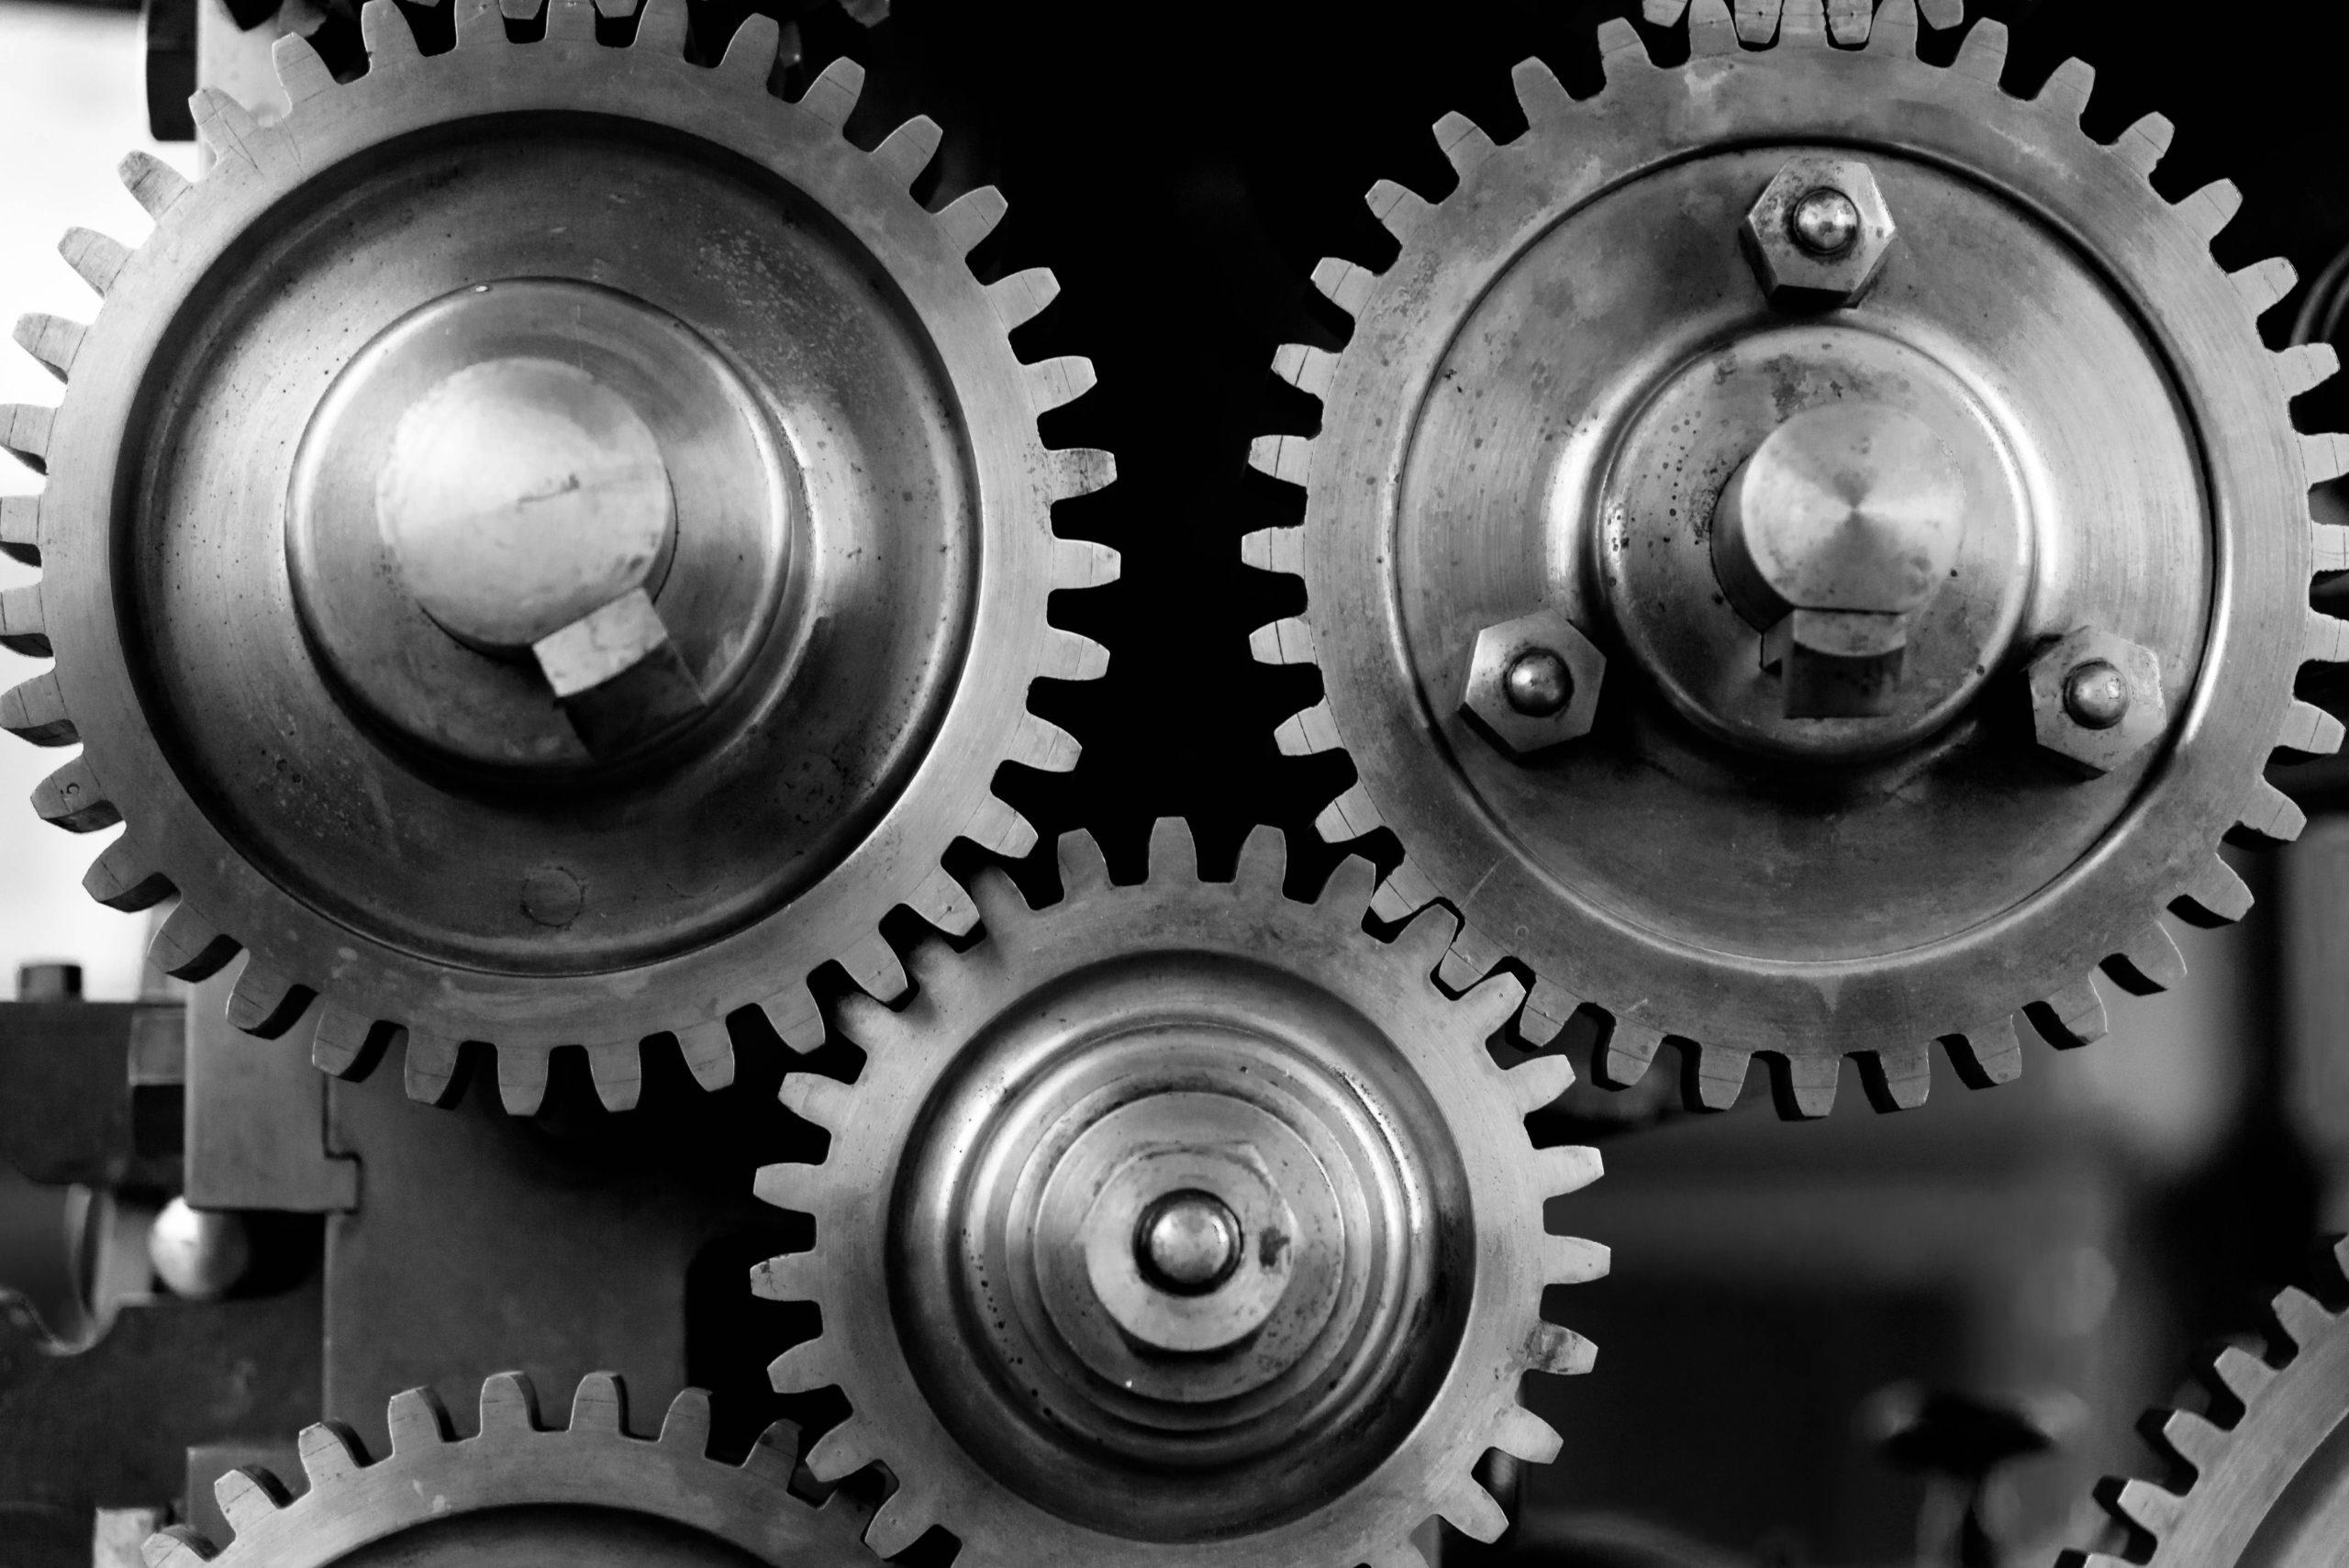 Get Disruption Ready: Process Improvement & Automation